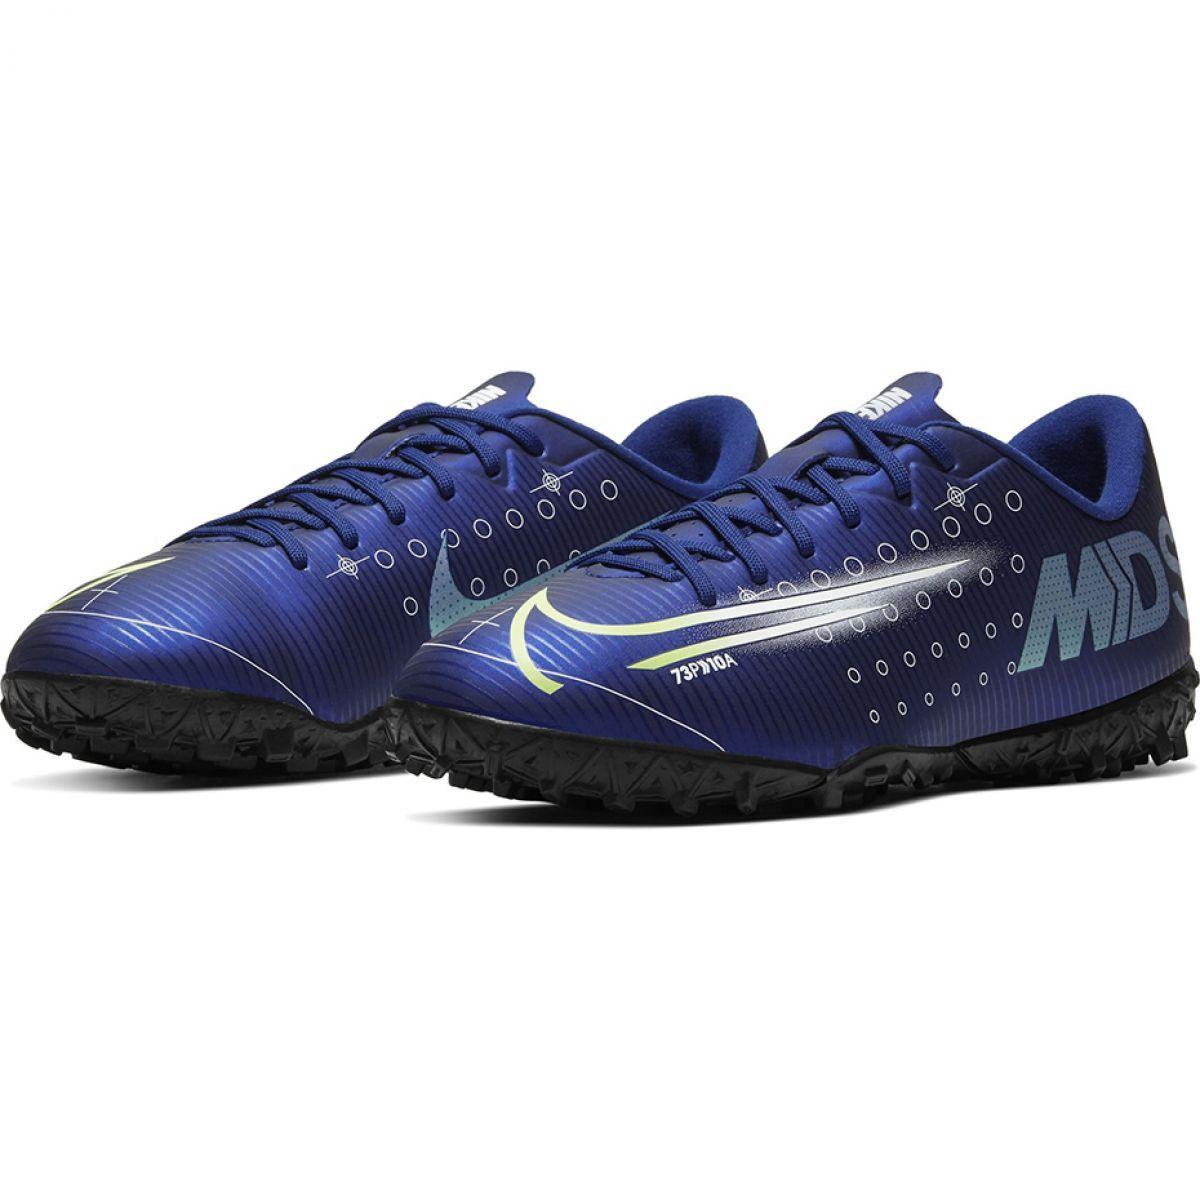 Buty Pilkarskie Nike Mercurial Vapor 13 Academy Mds Tf M Cj1306 401 Granatowe Granatowe Astro Turf Trainers Kids Football Boots Football Boots Astro